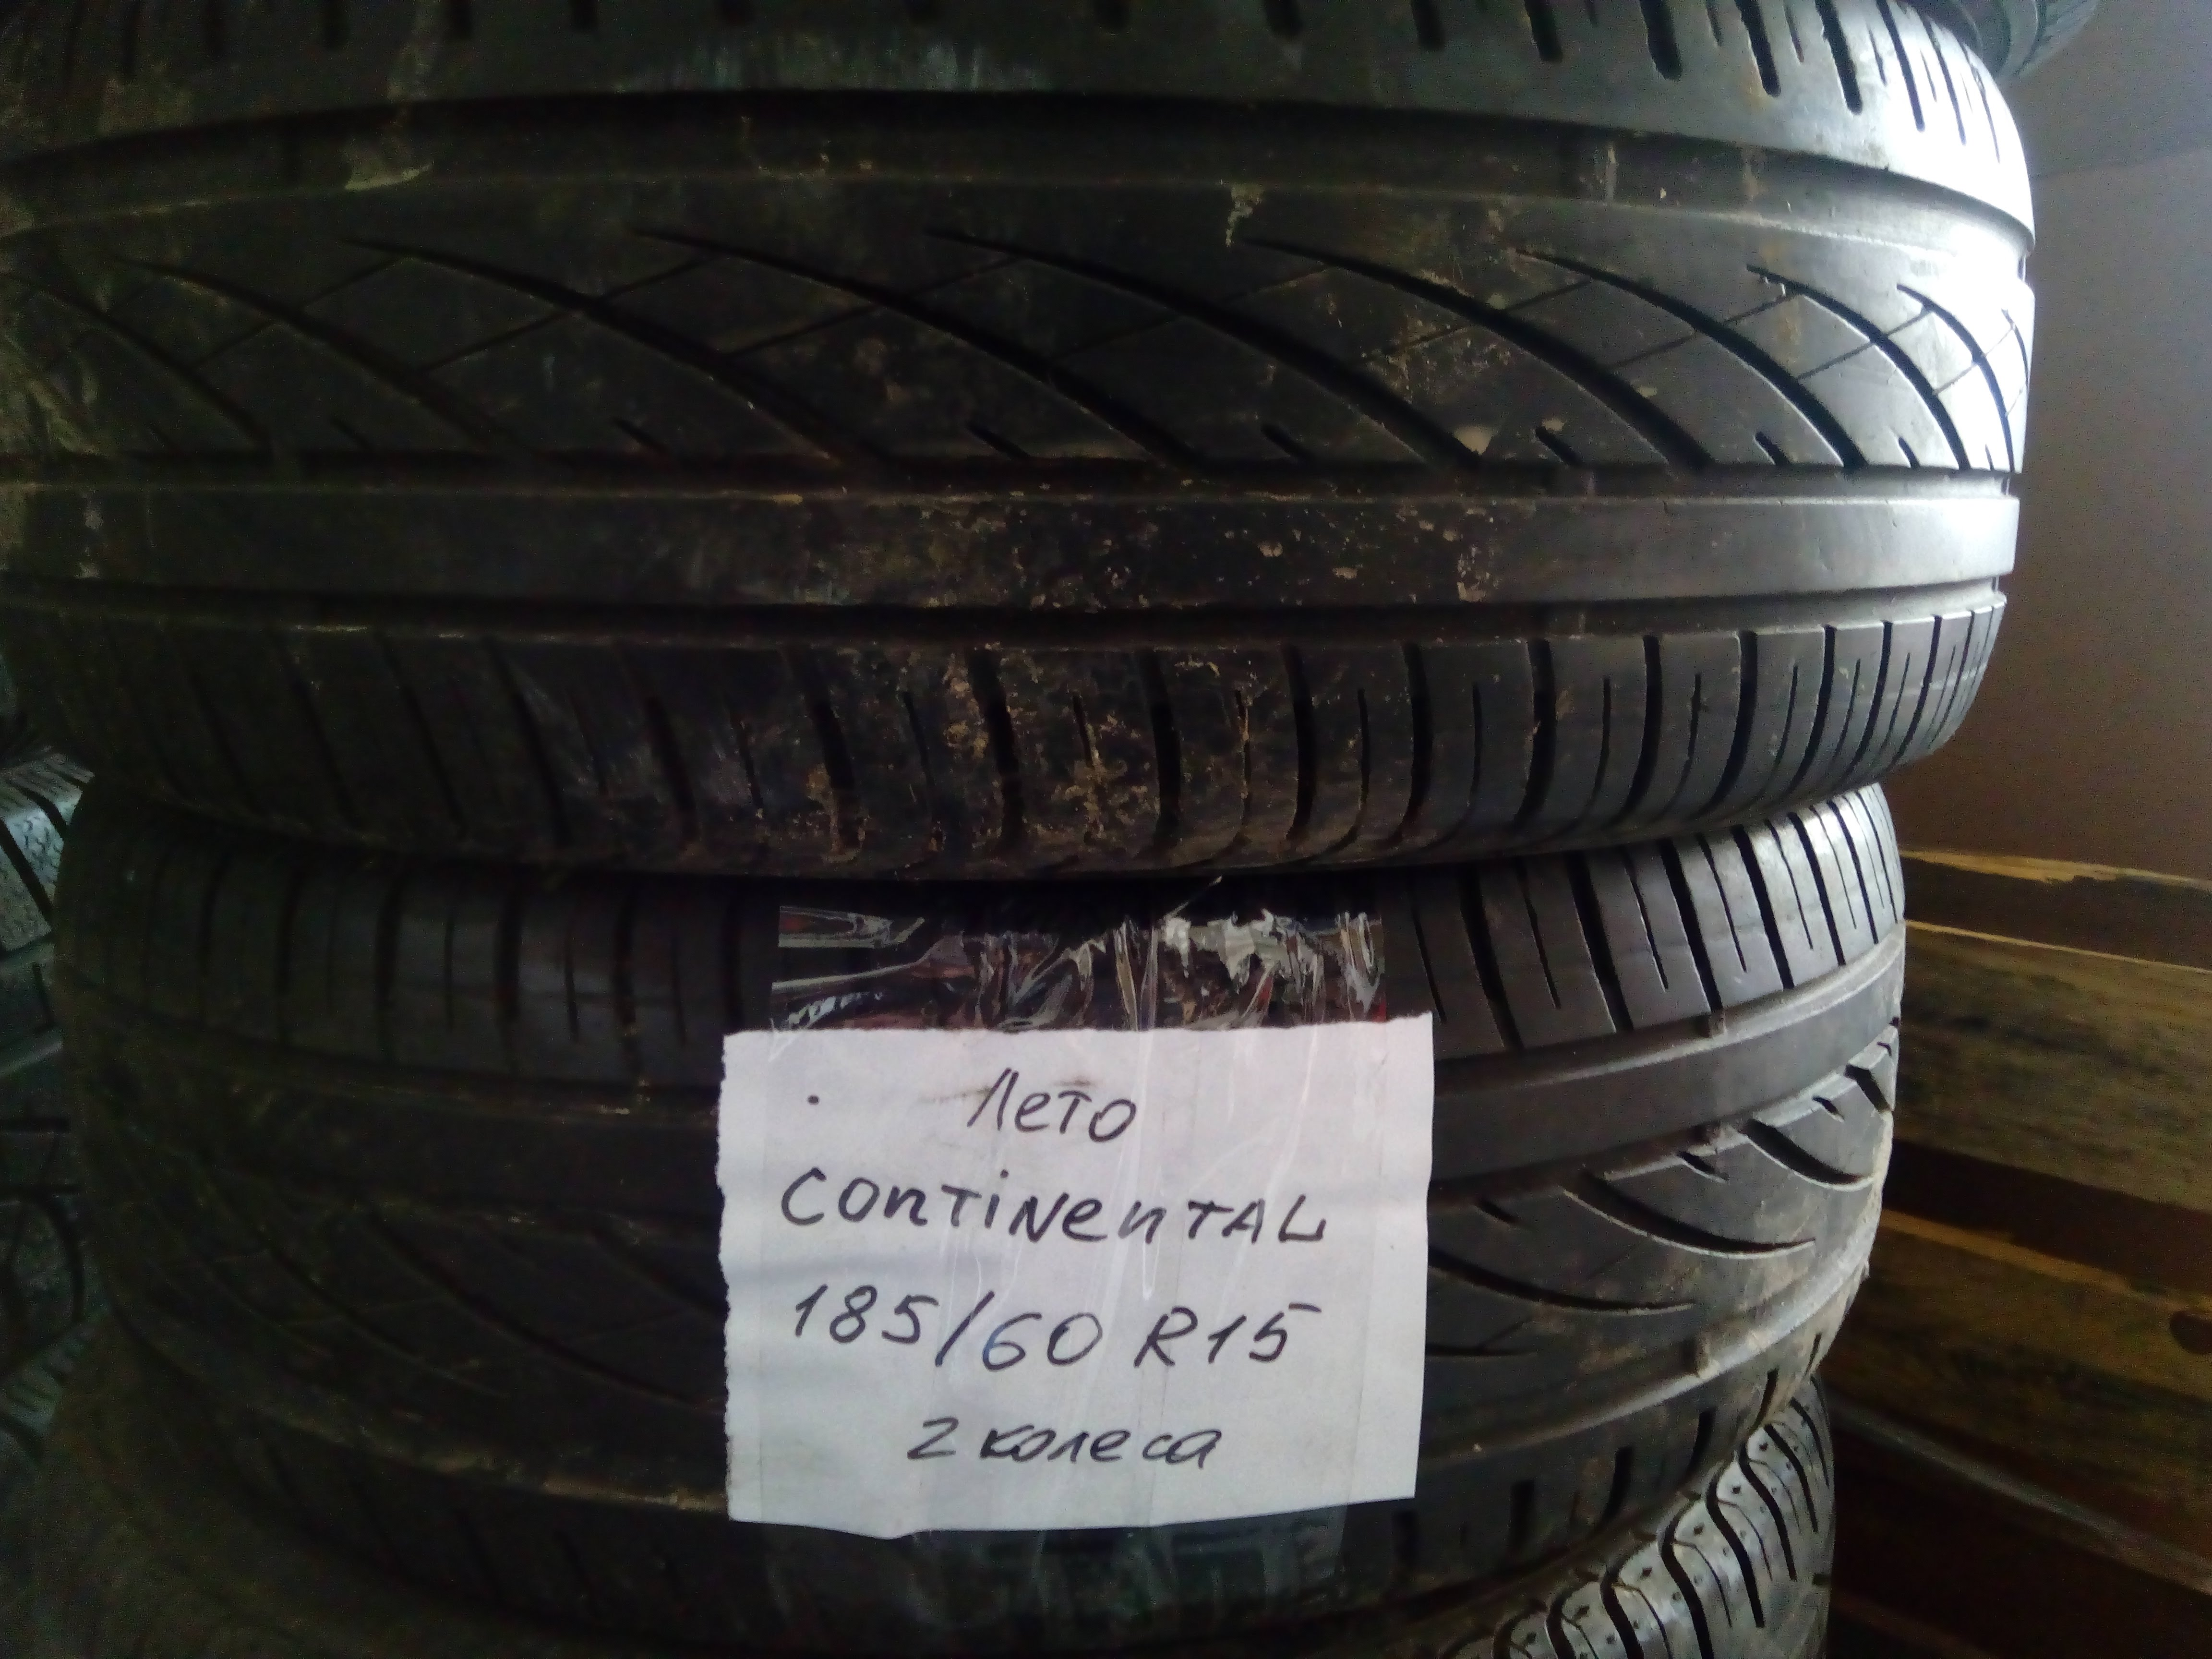 Киев продажа бу колес Continental 185/60 r15 2 шт лето